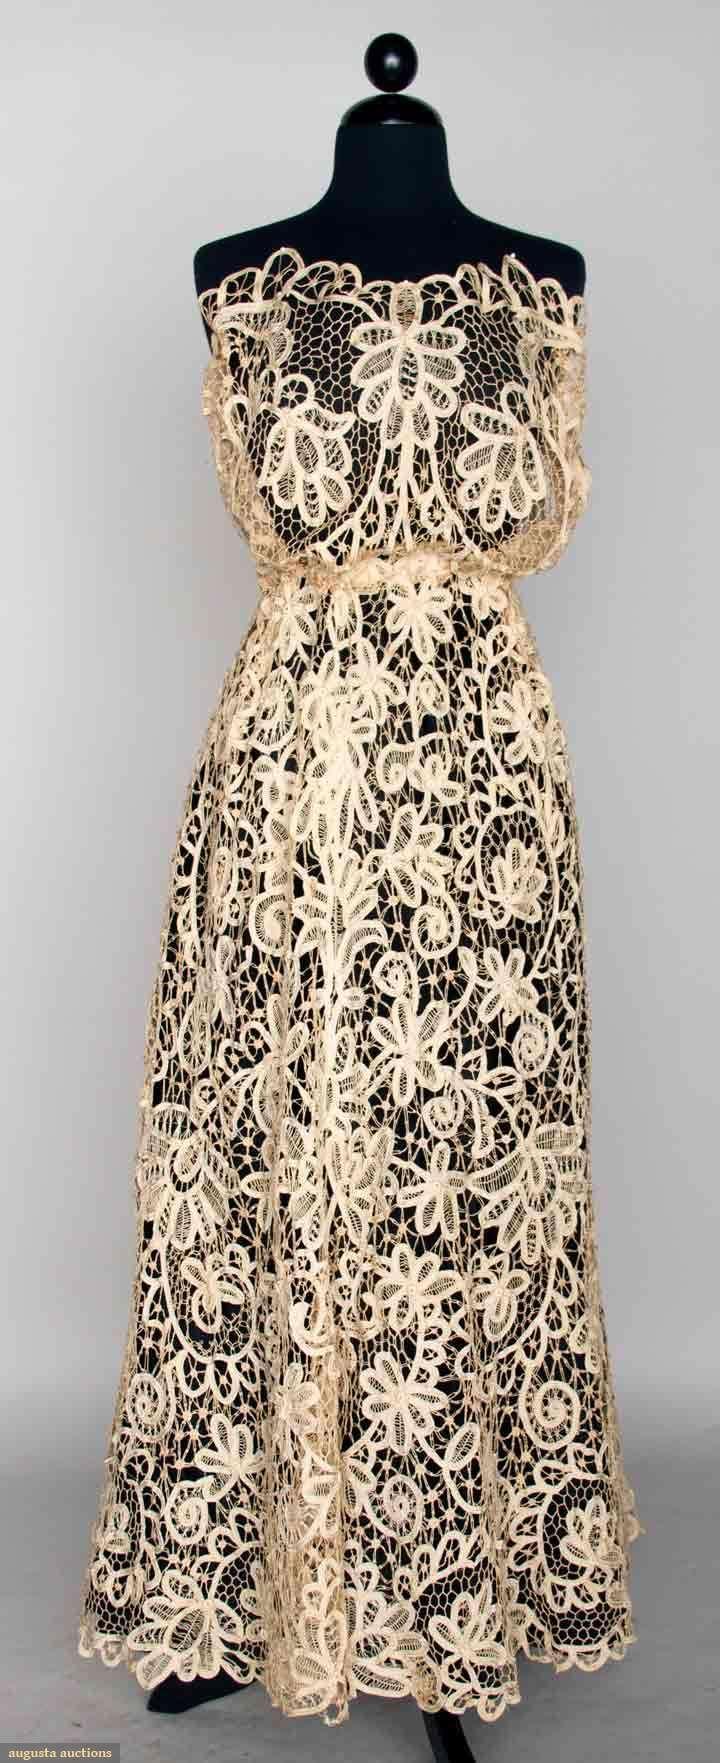 Battenburg Lace Empire Dress, C. 1908, Augusta Auctions, November 13, 2013 - NYC